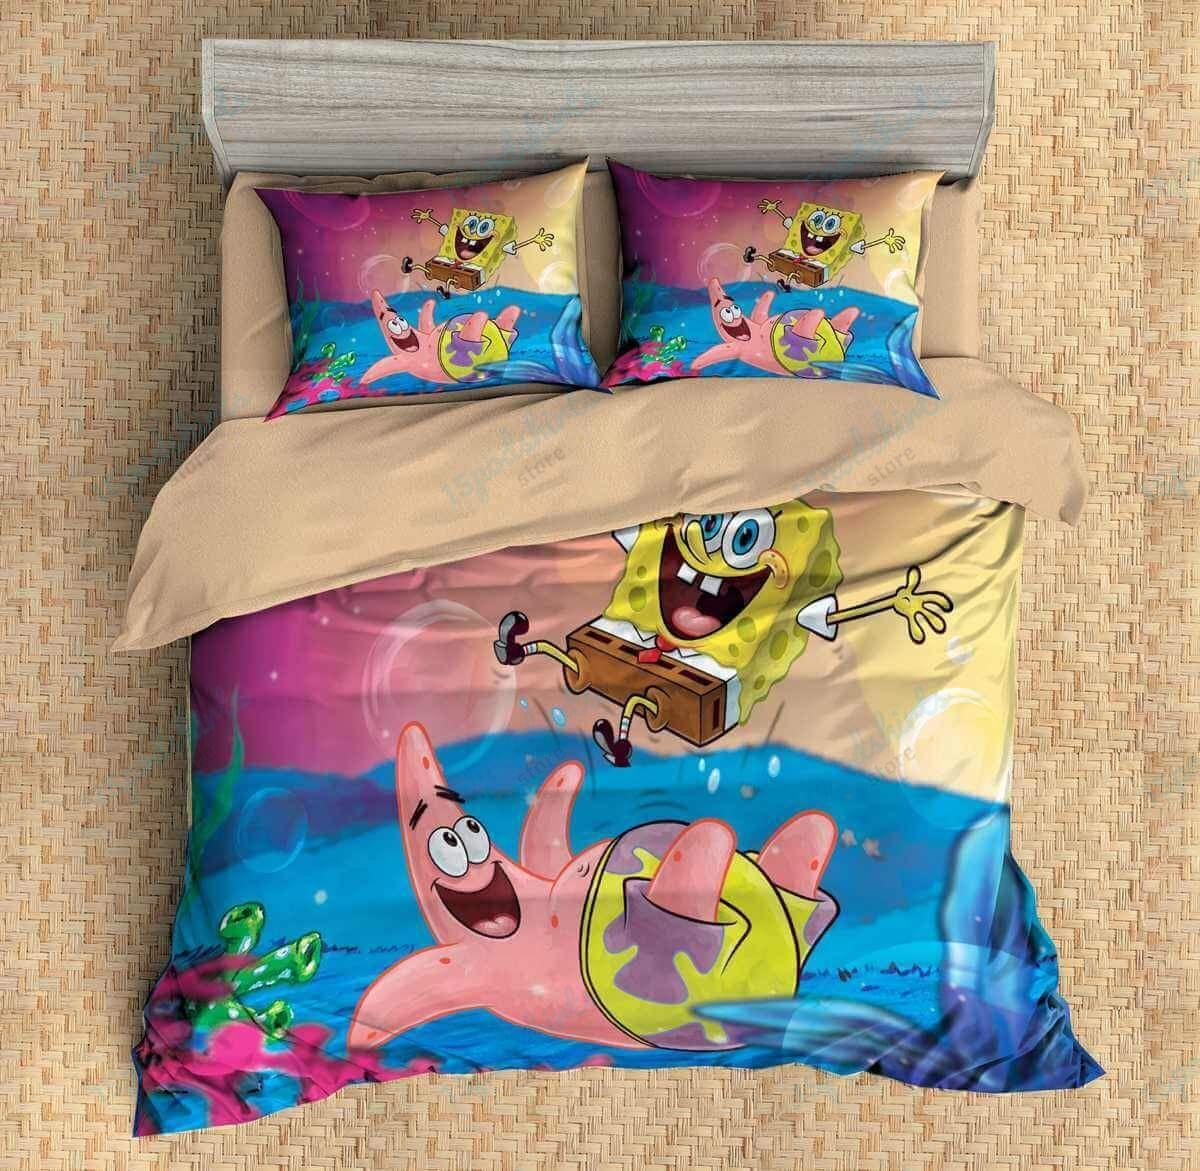 Spongebob Squarepants 2 Duvet Cover Bedding Set